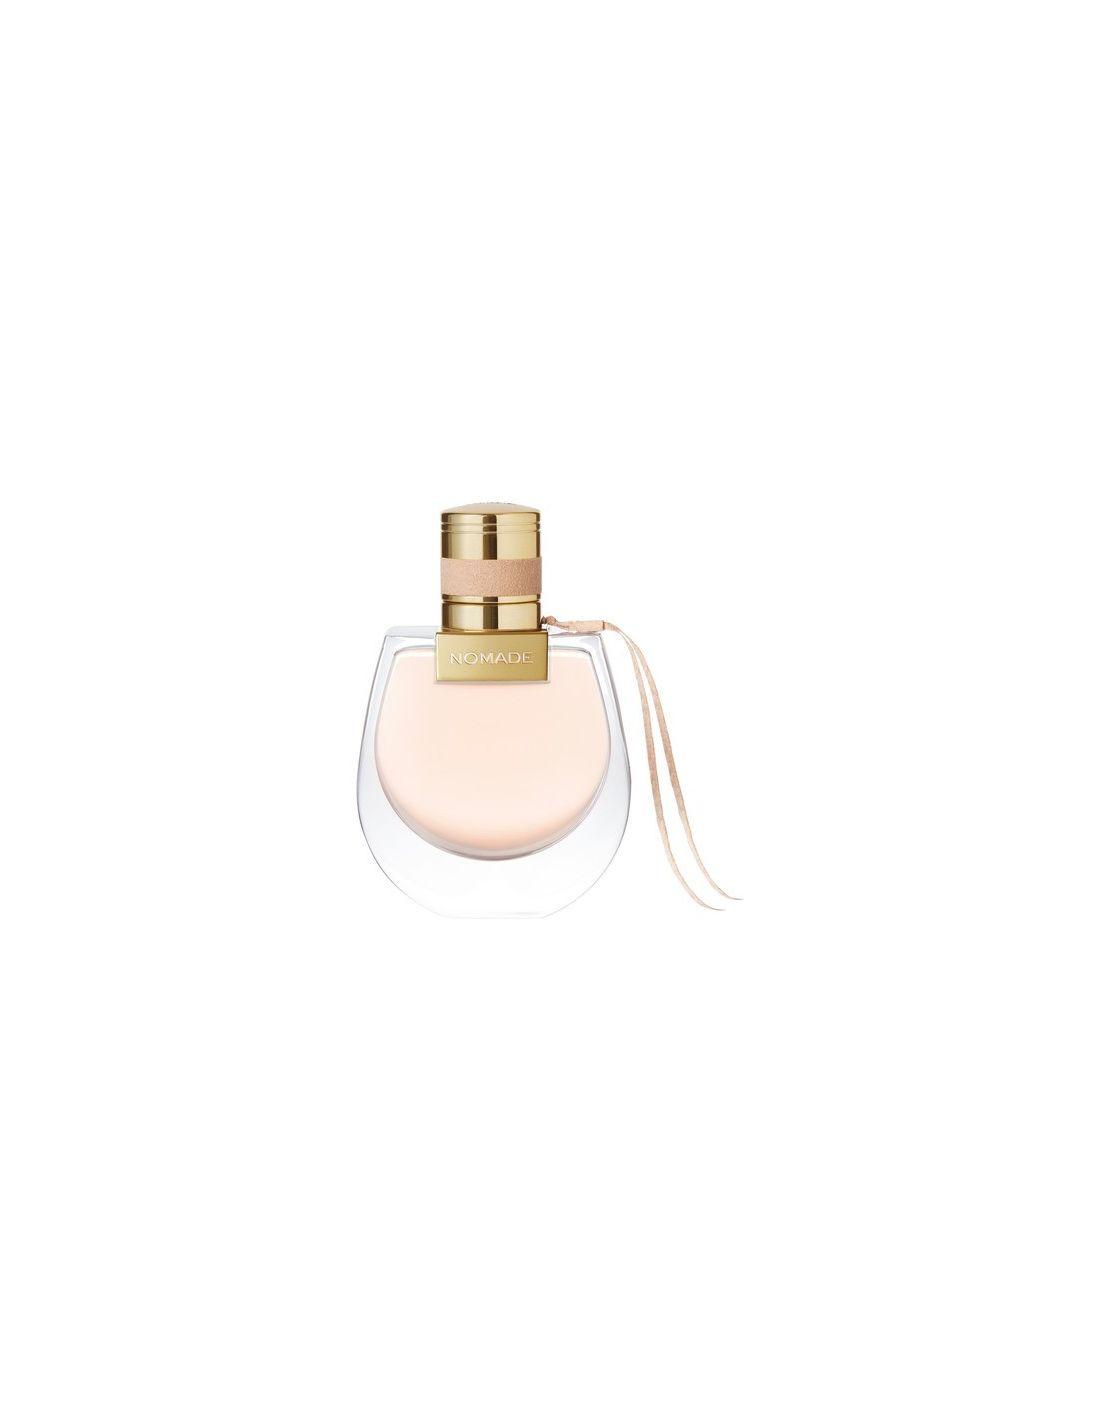 chlo nomade eau de parfum 50 mlchlo nomade eau de parfum. Black Bedroom Furniture Sets. Home Design Ideas